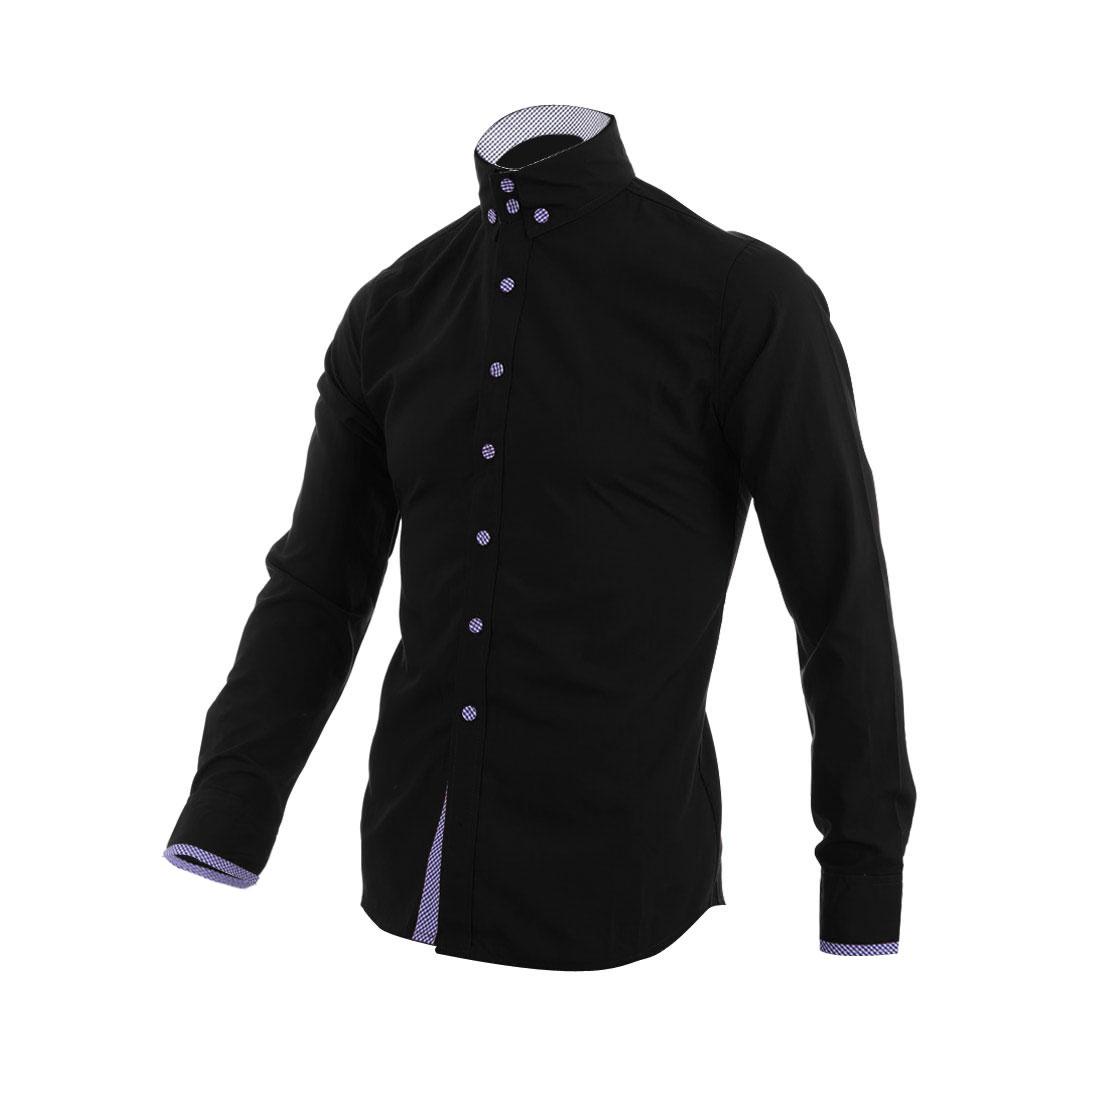 Men Button Closure Plaids Decor Cuffs Shirt Black M